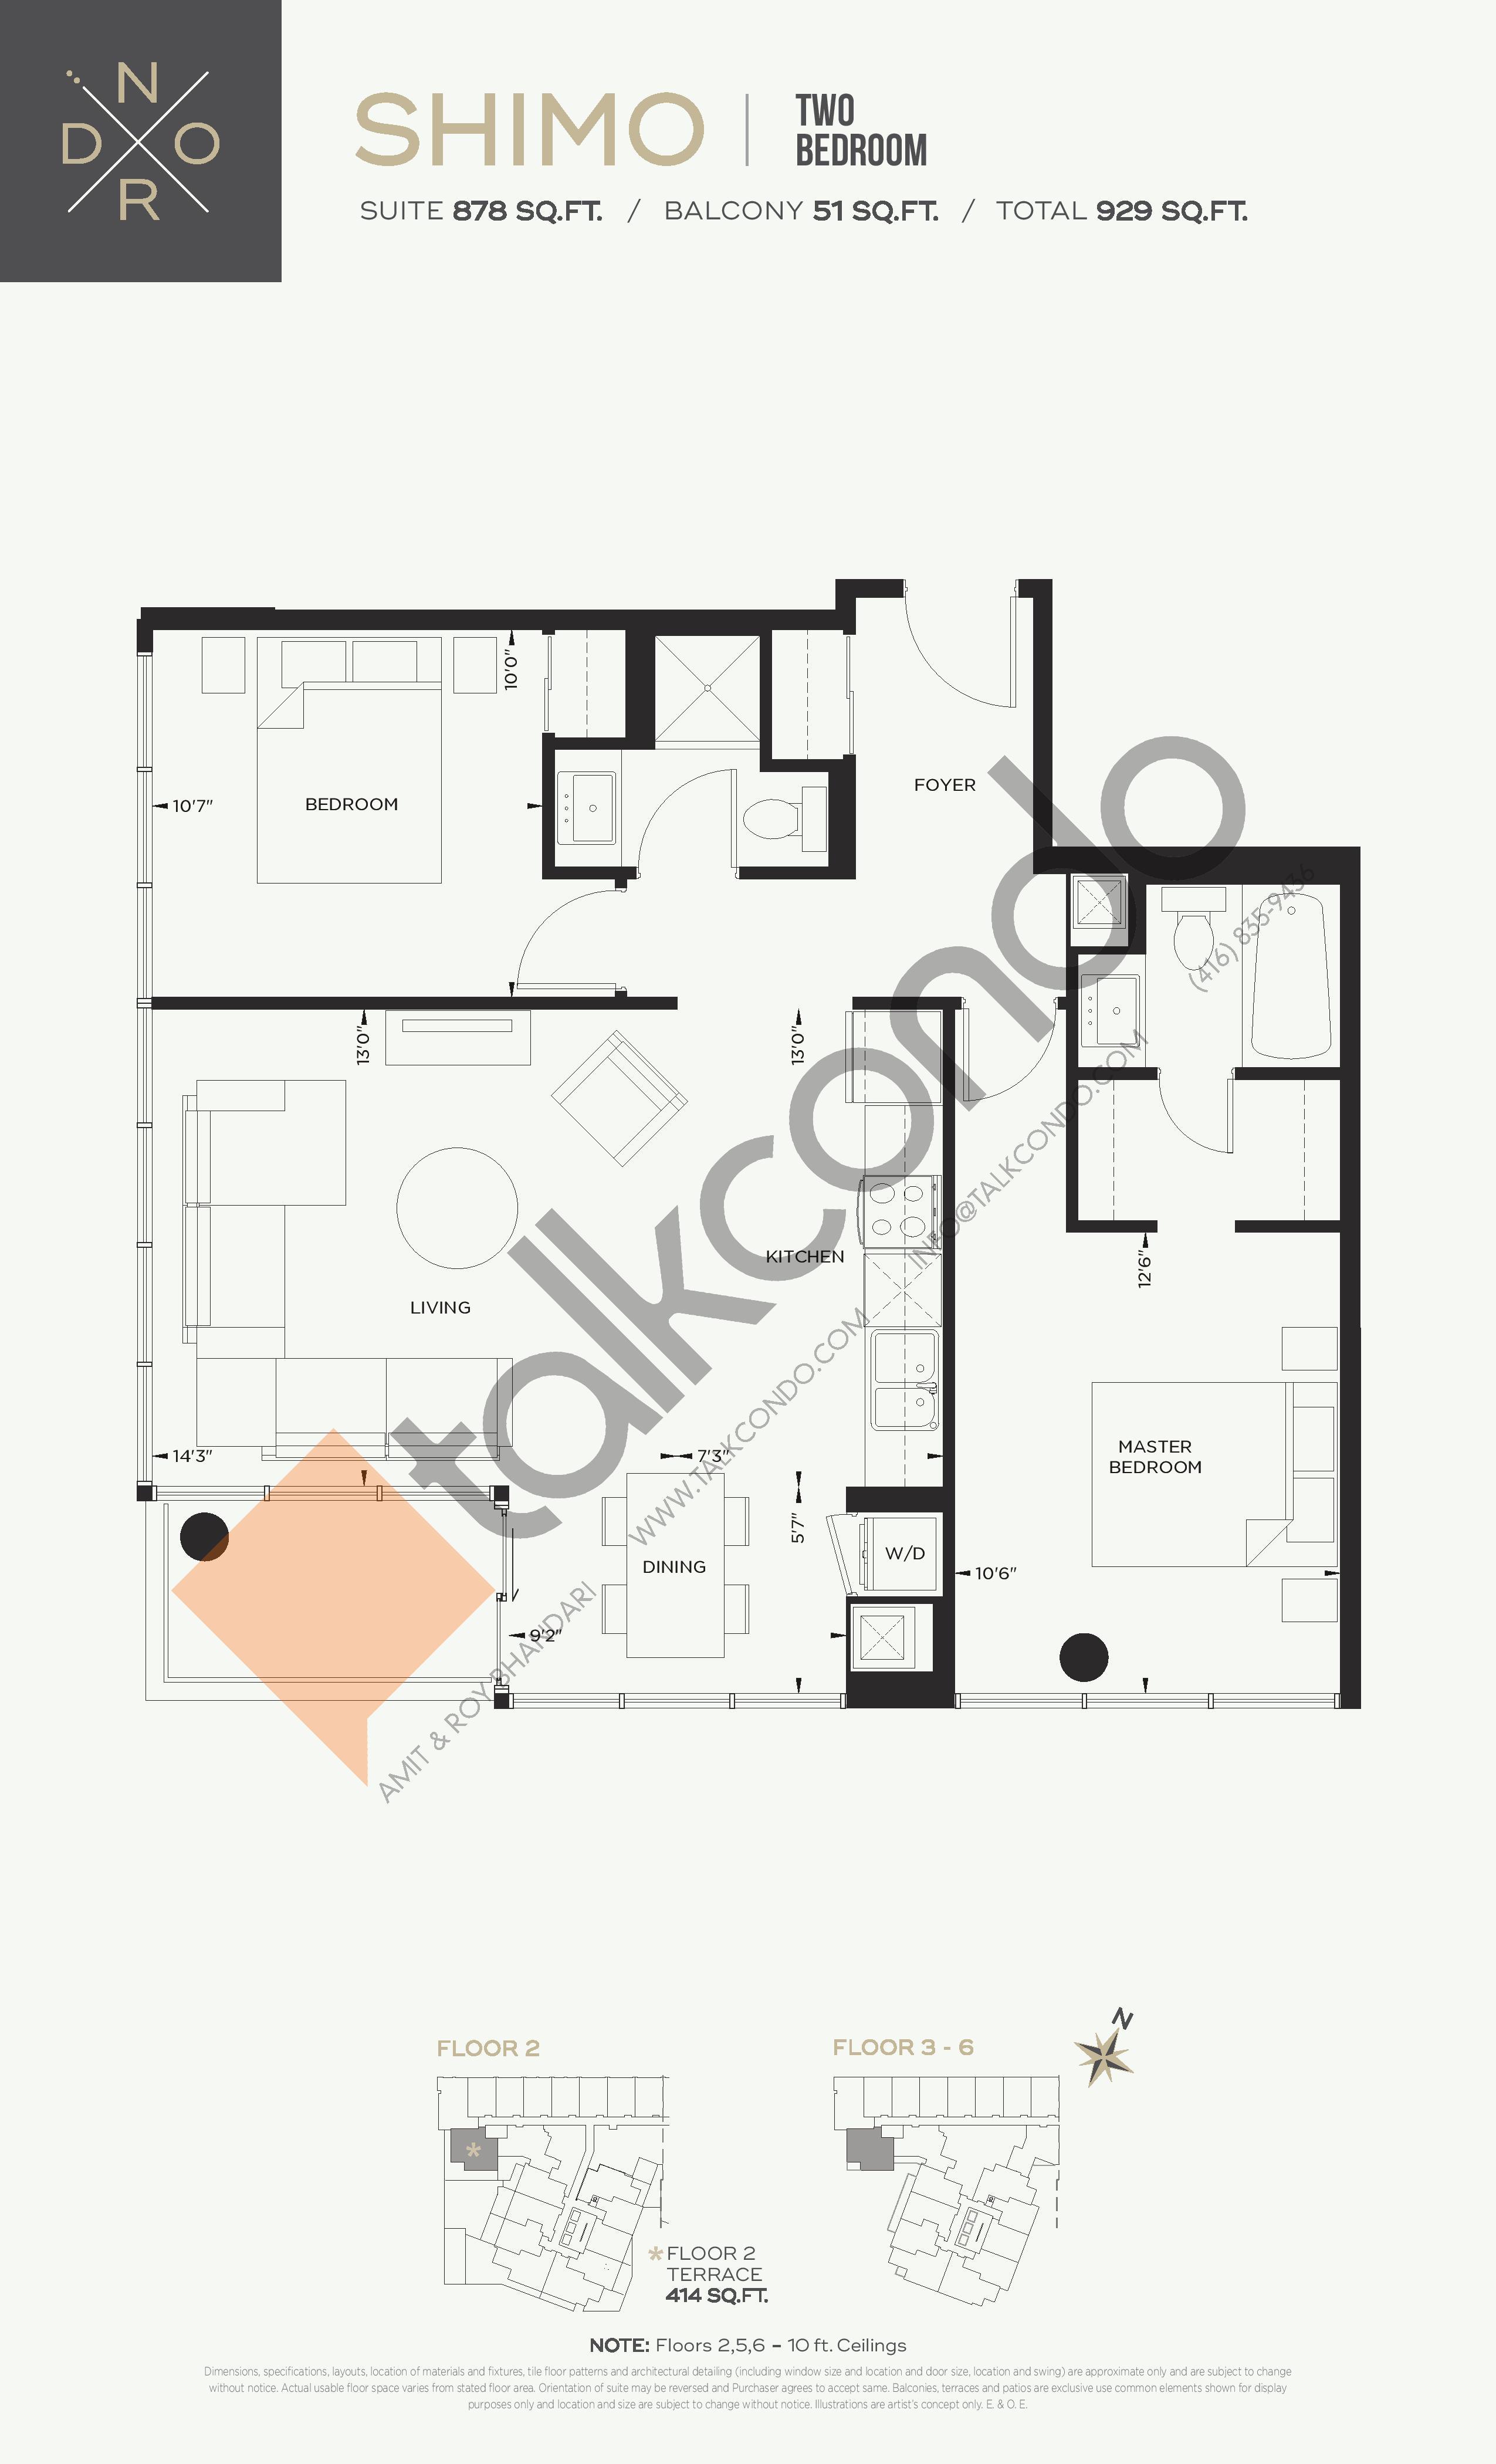 Shimo Floor Plan at Nord West at Expo City Condos - 878 sq.ft